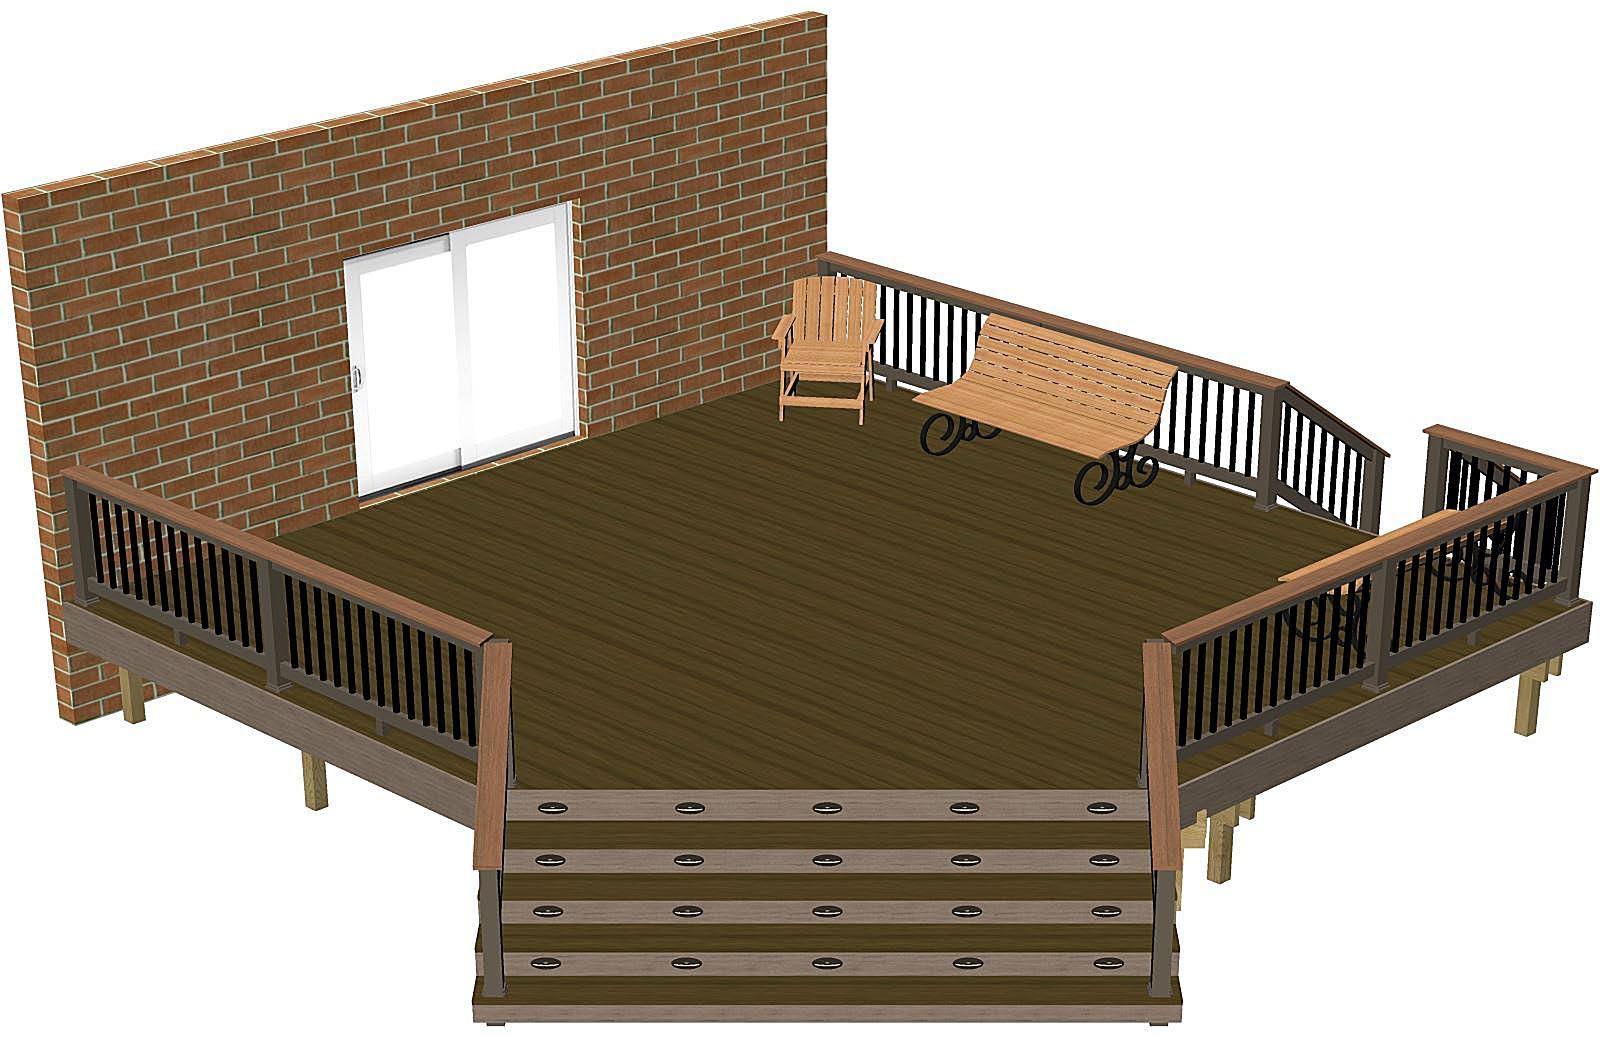 Free plans to build a gazebo pergola design ideas for Create building plans